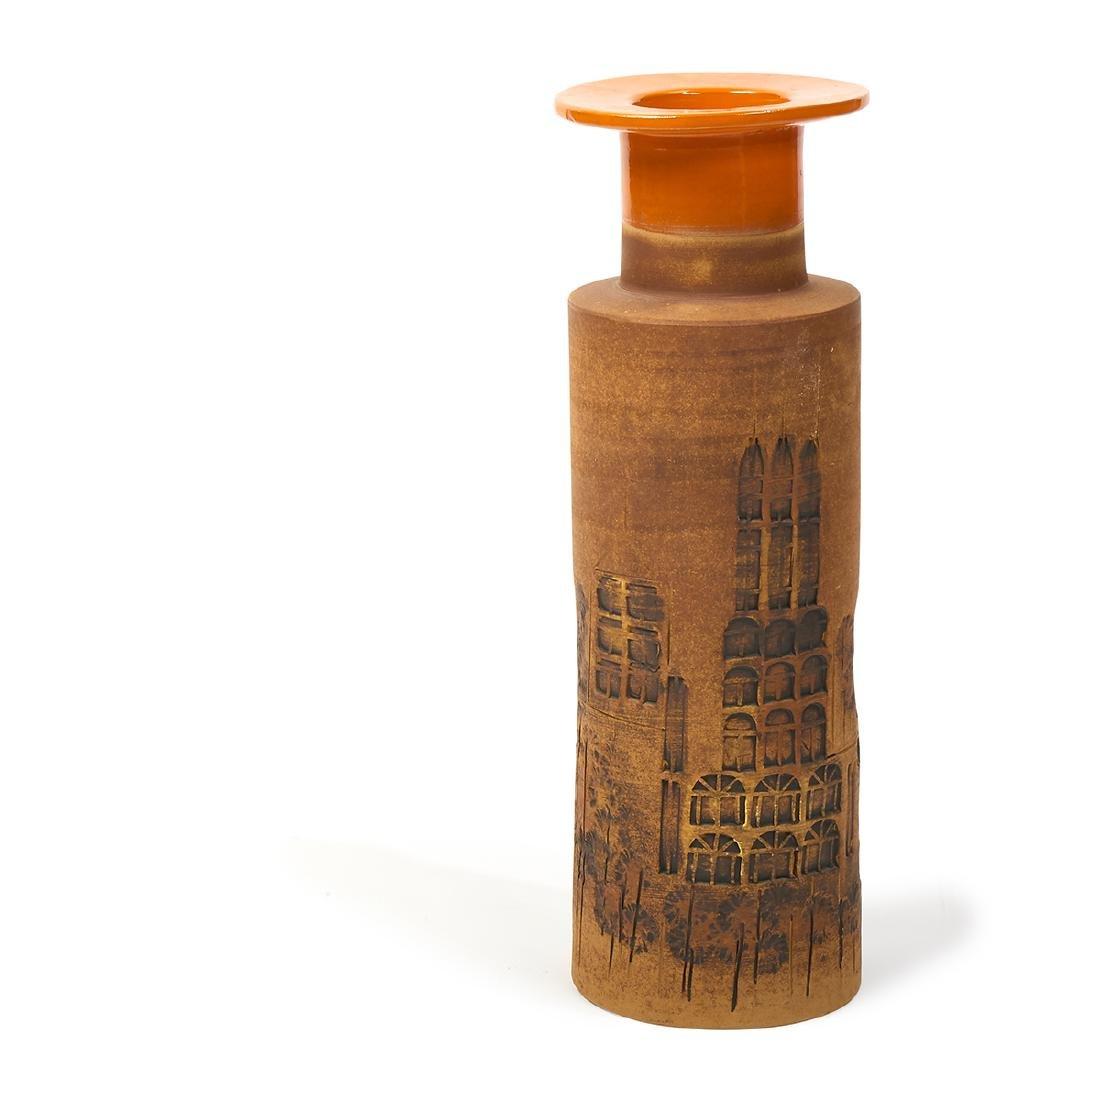 Aldo Londi for Raymor 'Campus' vase